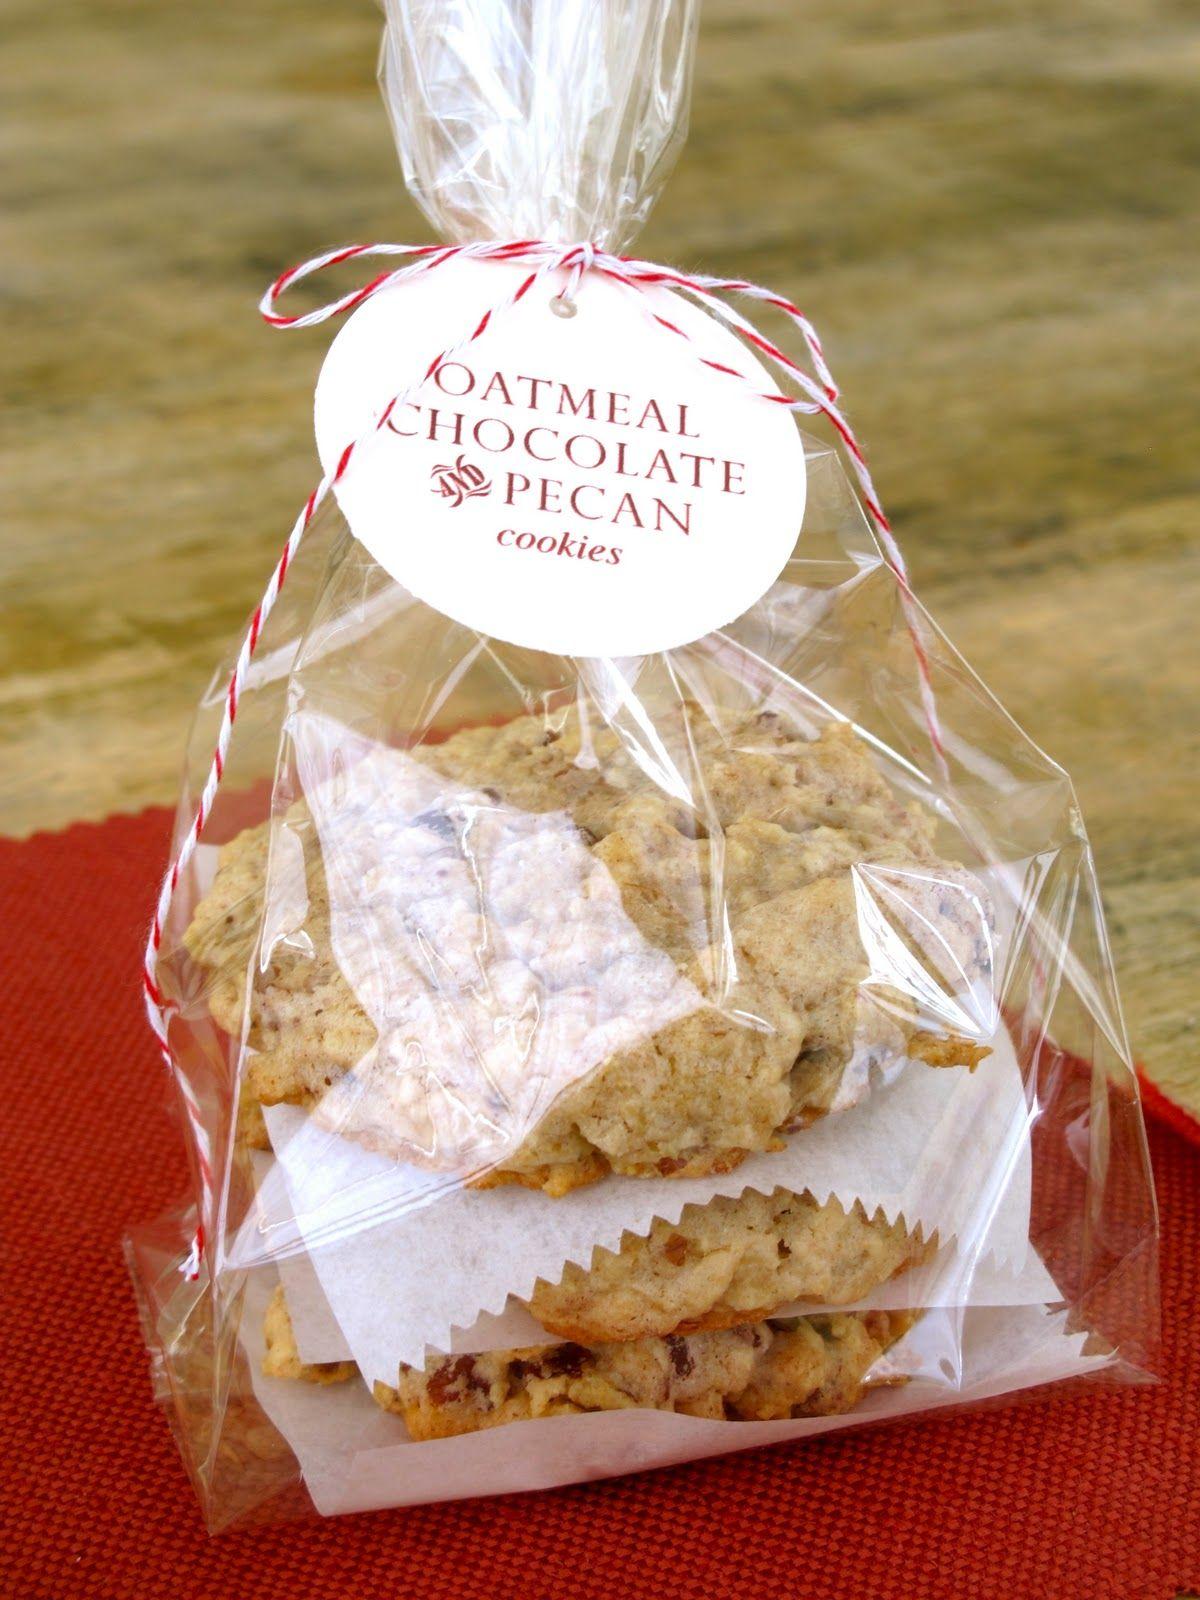 Pecan, Chocolate & Oatmeal Cookies- grown-up chocolate ... Oatmeal Chocolate Chip Cookies Packaging